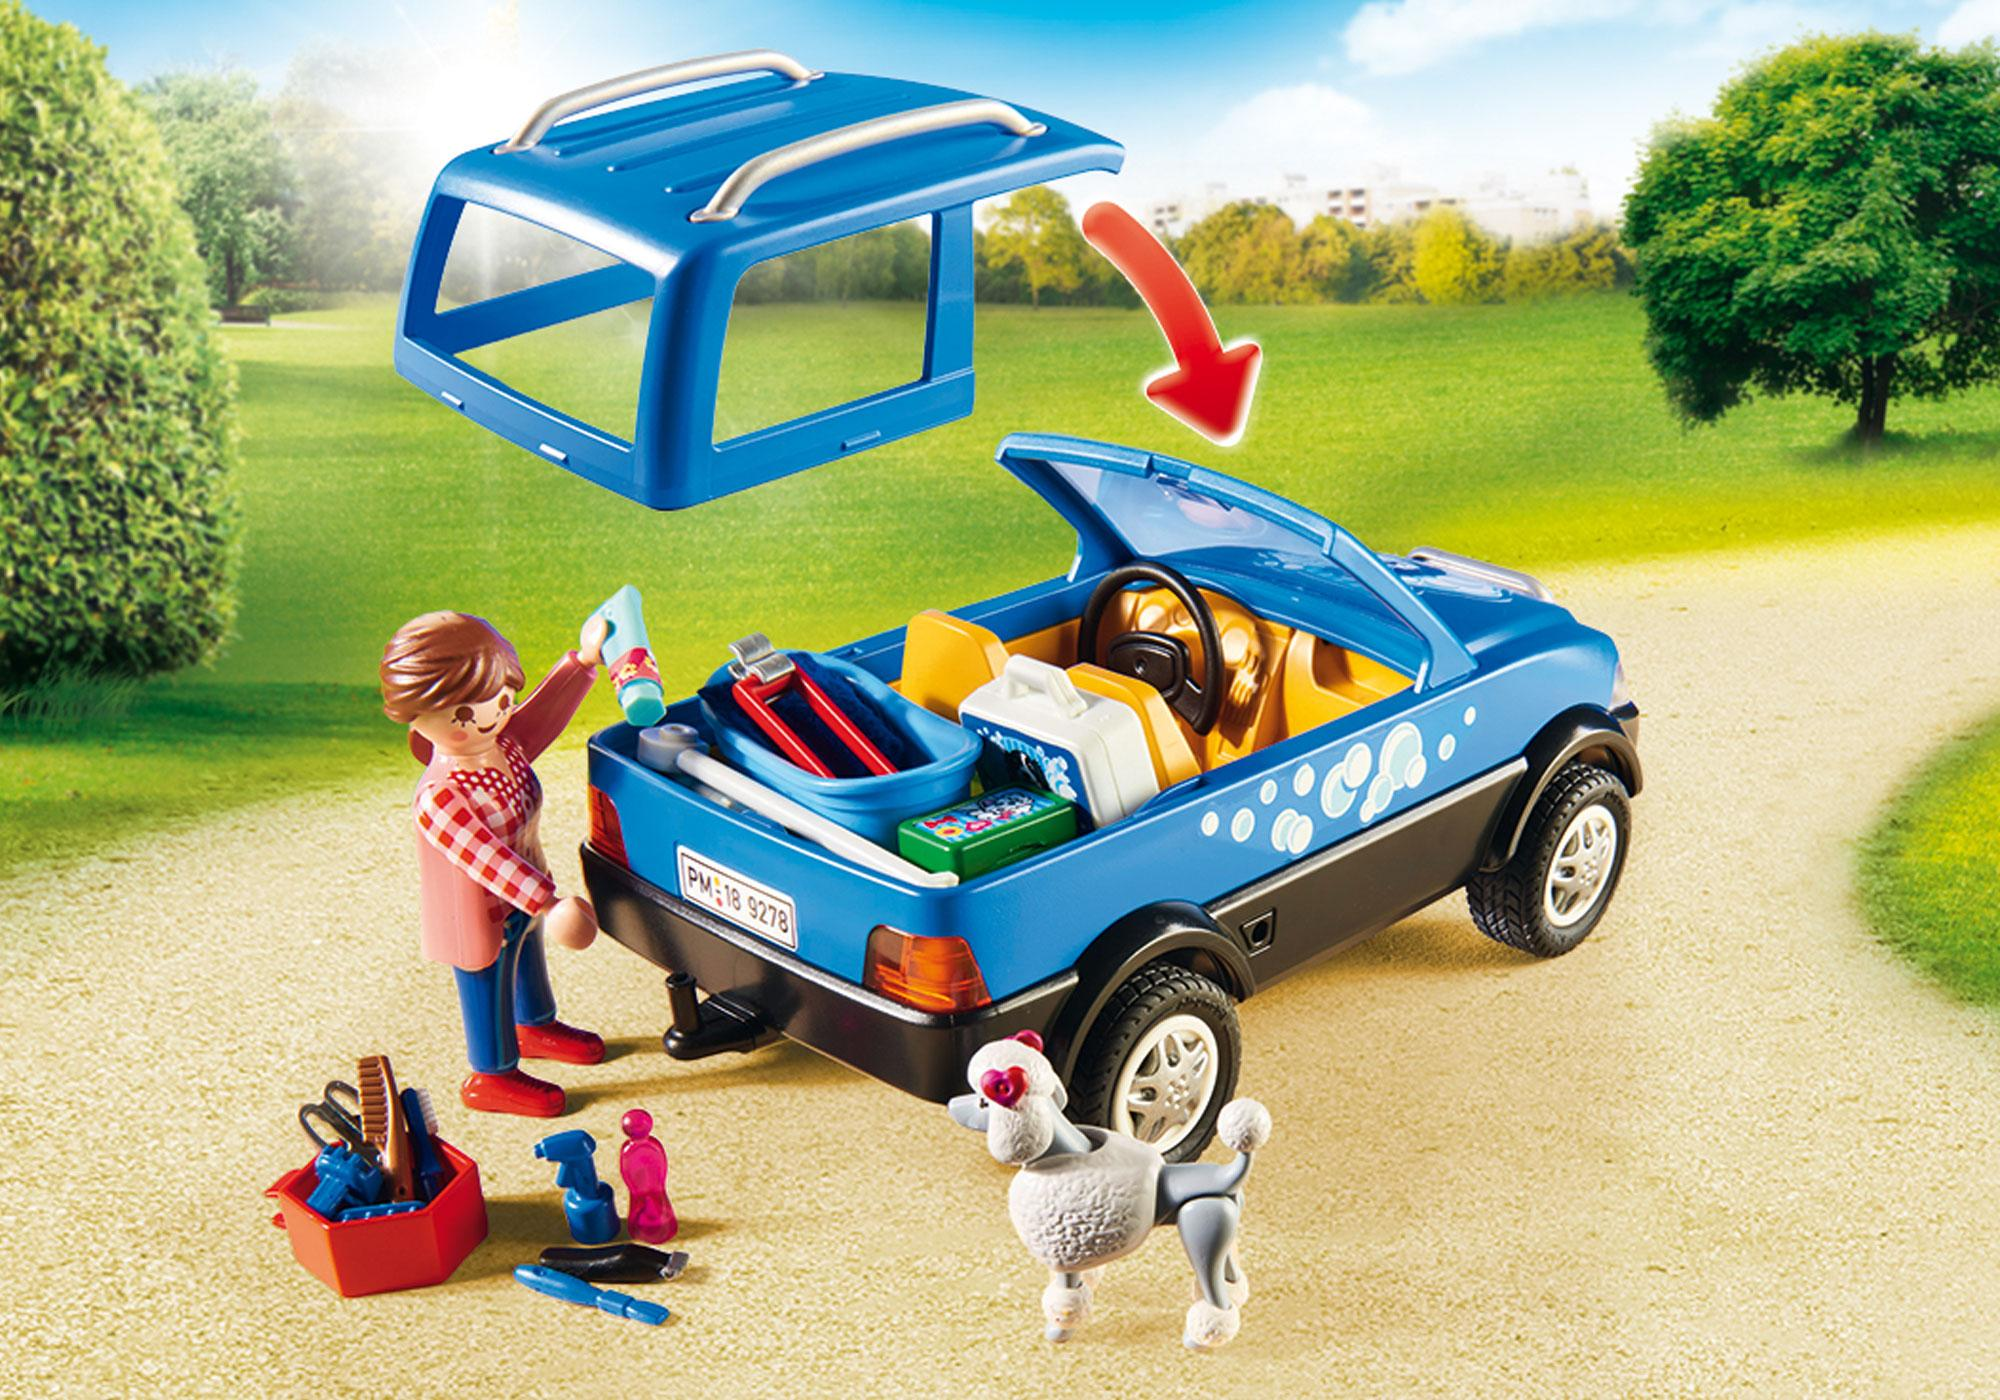 http://media.playmobil.com/i/playmobil/9278_product_extra1/Κινητή μονάδα κτηνιατρικής φροντίδας